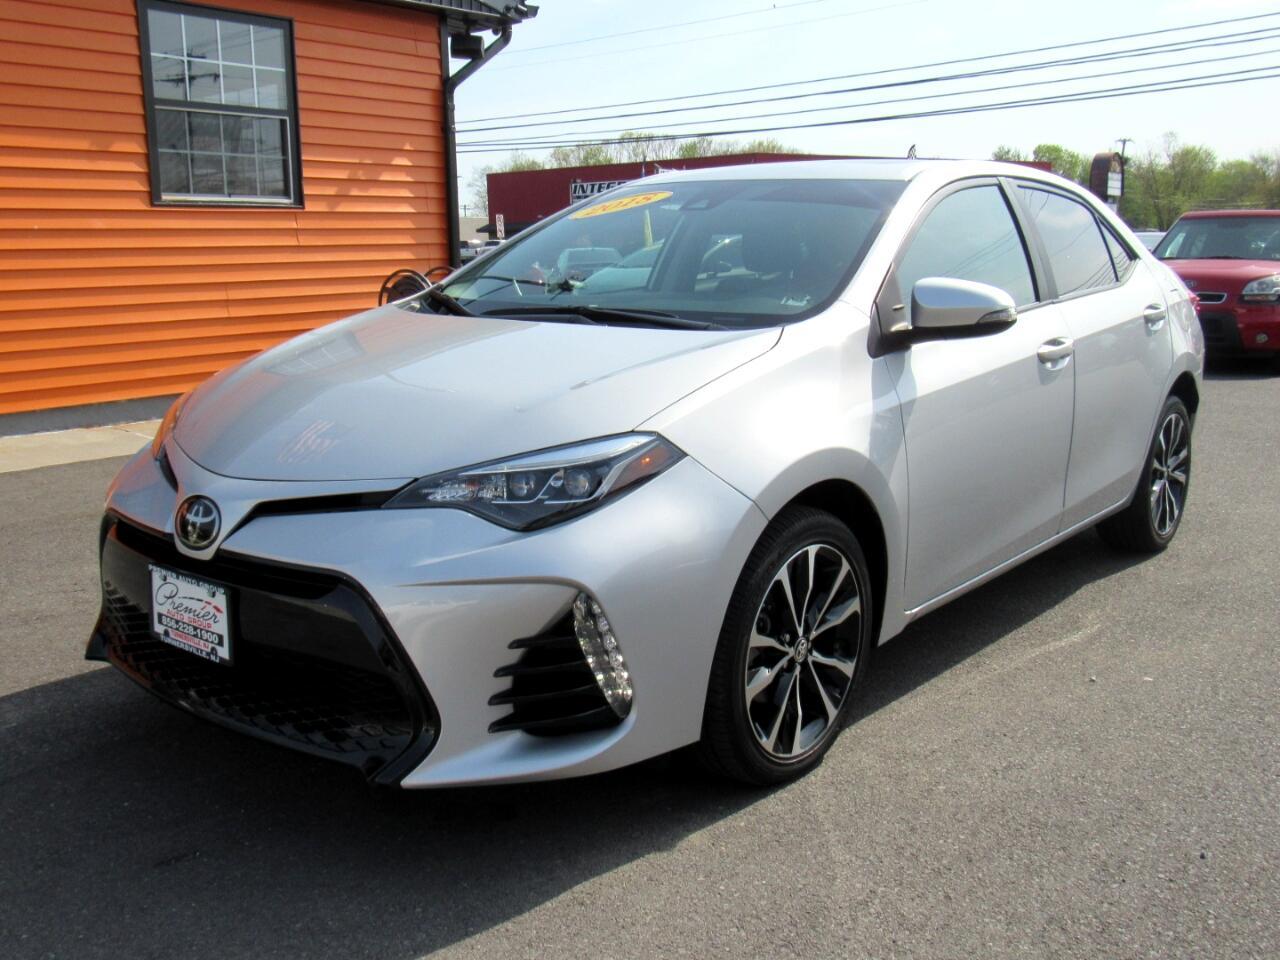 Car Loan Calculator Kbb >> Used 2018 Toyota Corolla SE CVT for Sale in Turnersville NJ 08012 Premier Auto Group